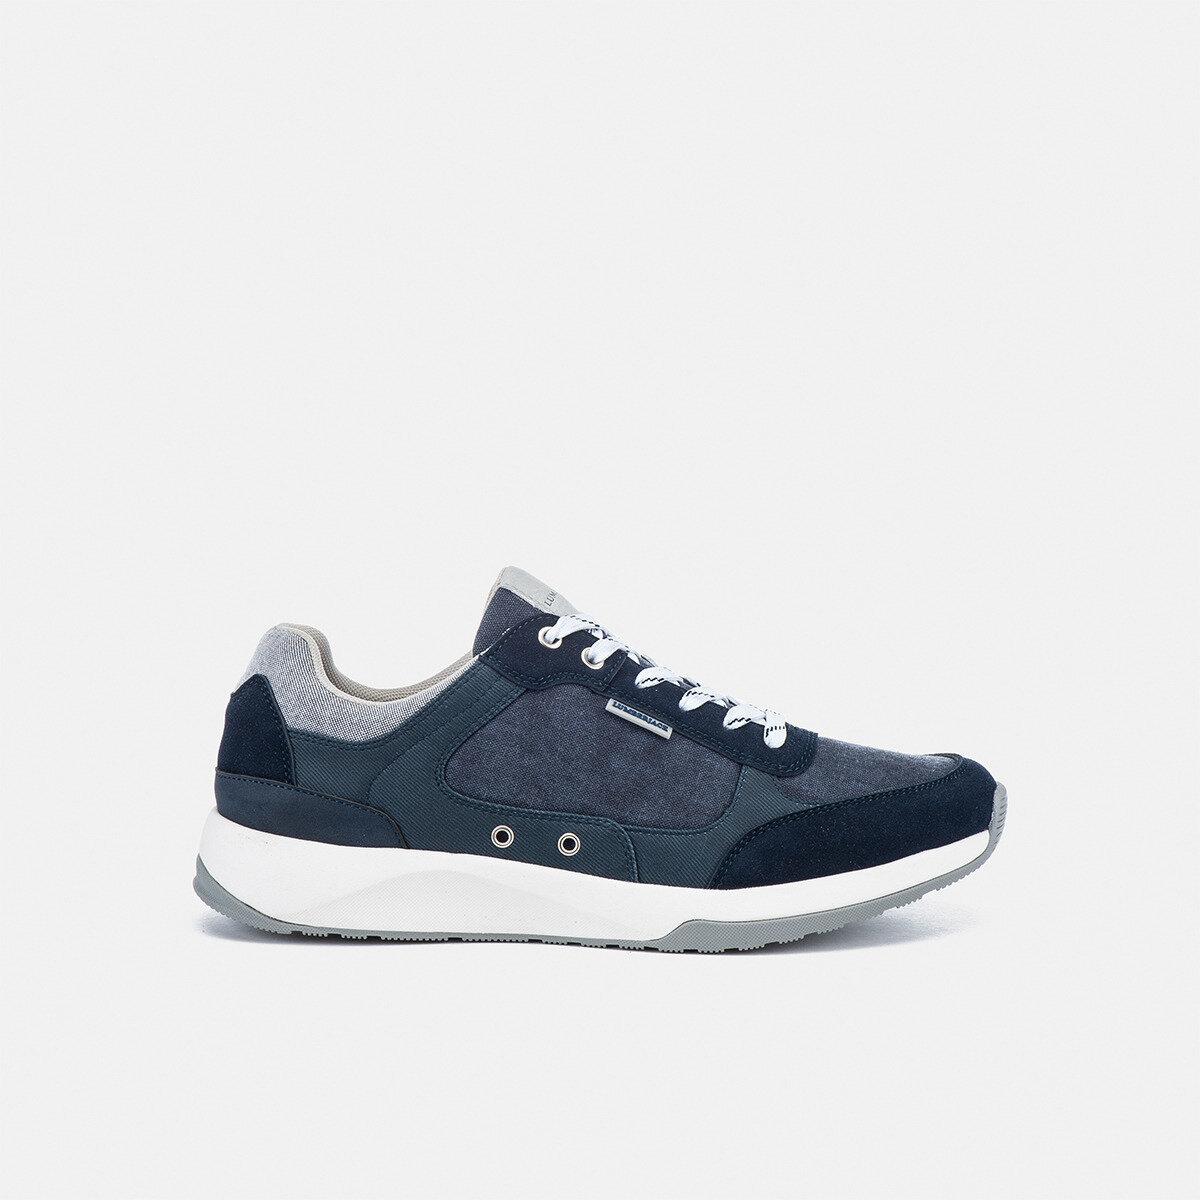 NANTES NAVY BLUE/GREY Man Sneakers